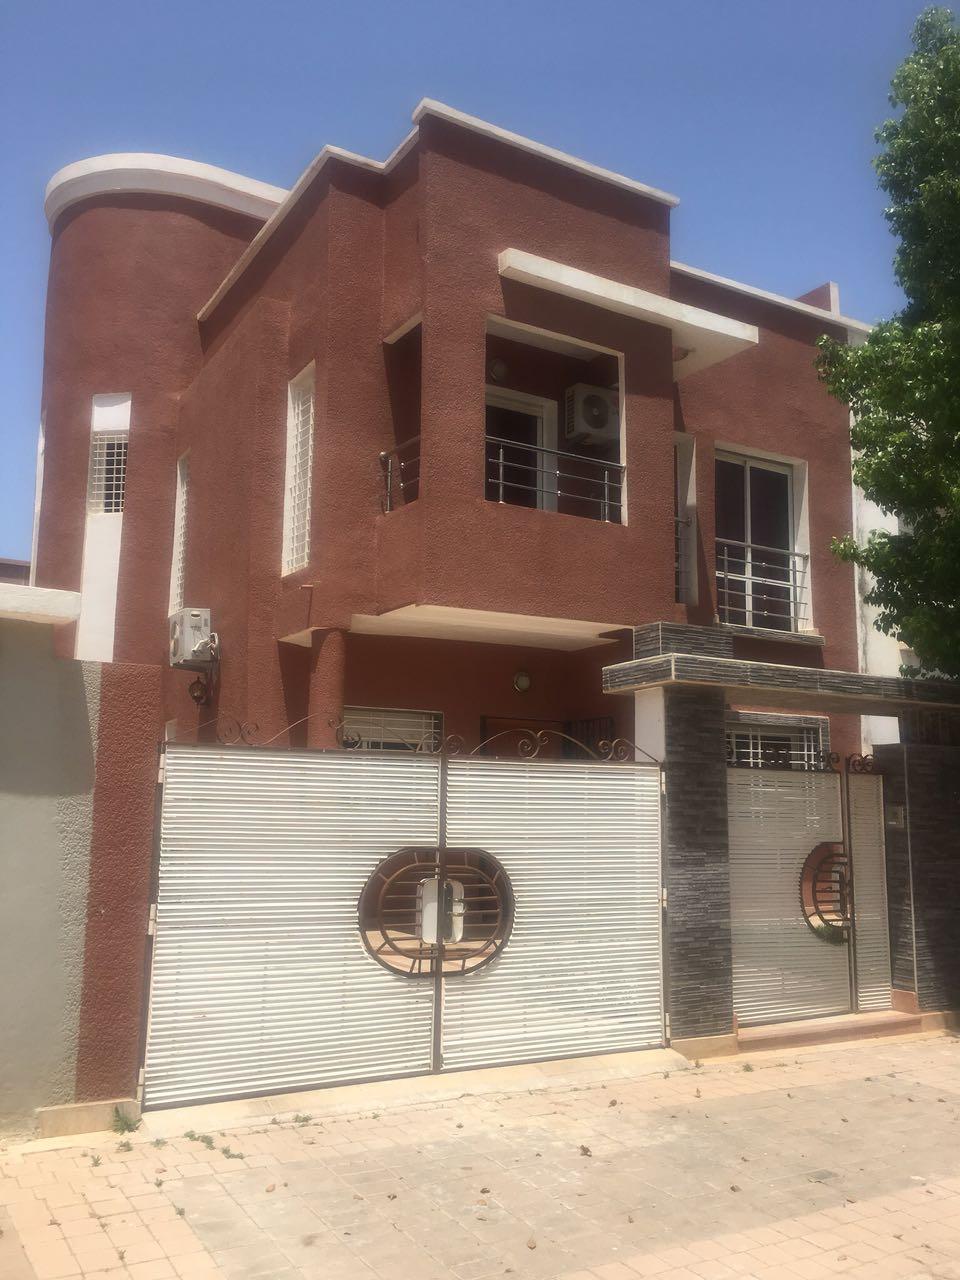 Villa in Saidia Marokko. 2 verdiepingen.